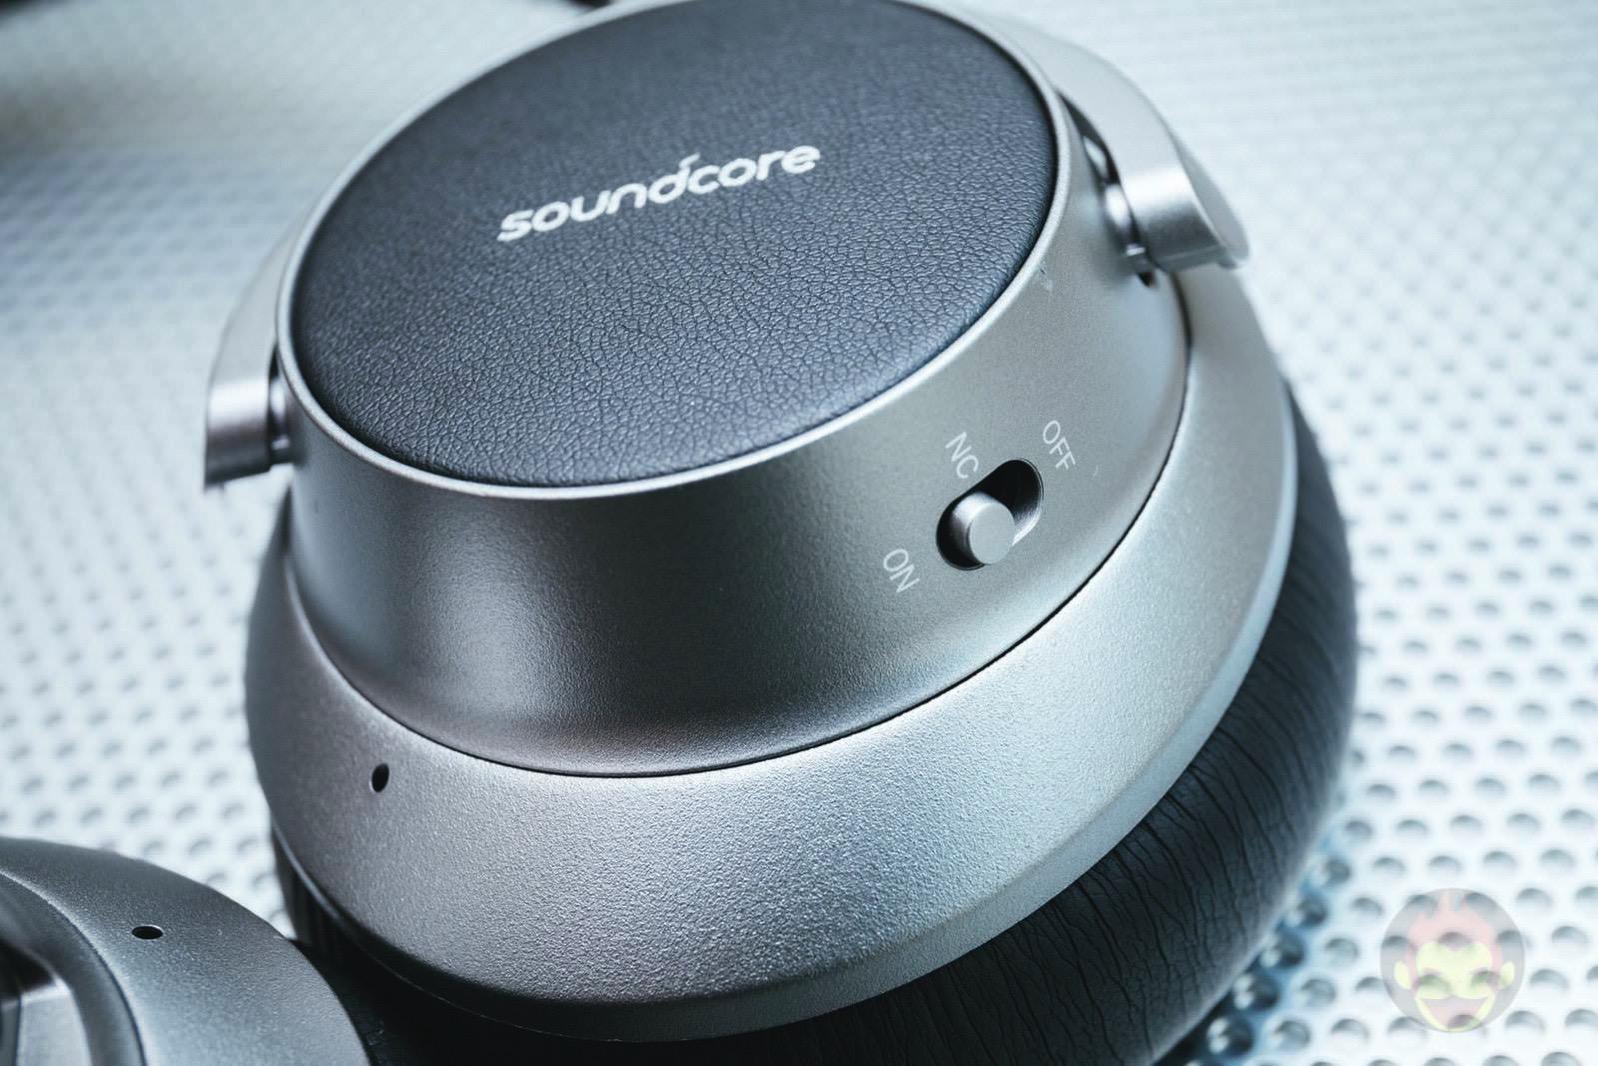 Soundcore-Space-NC-Wireless-Headphones-10.jpg